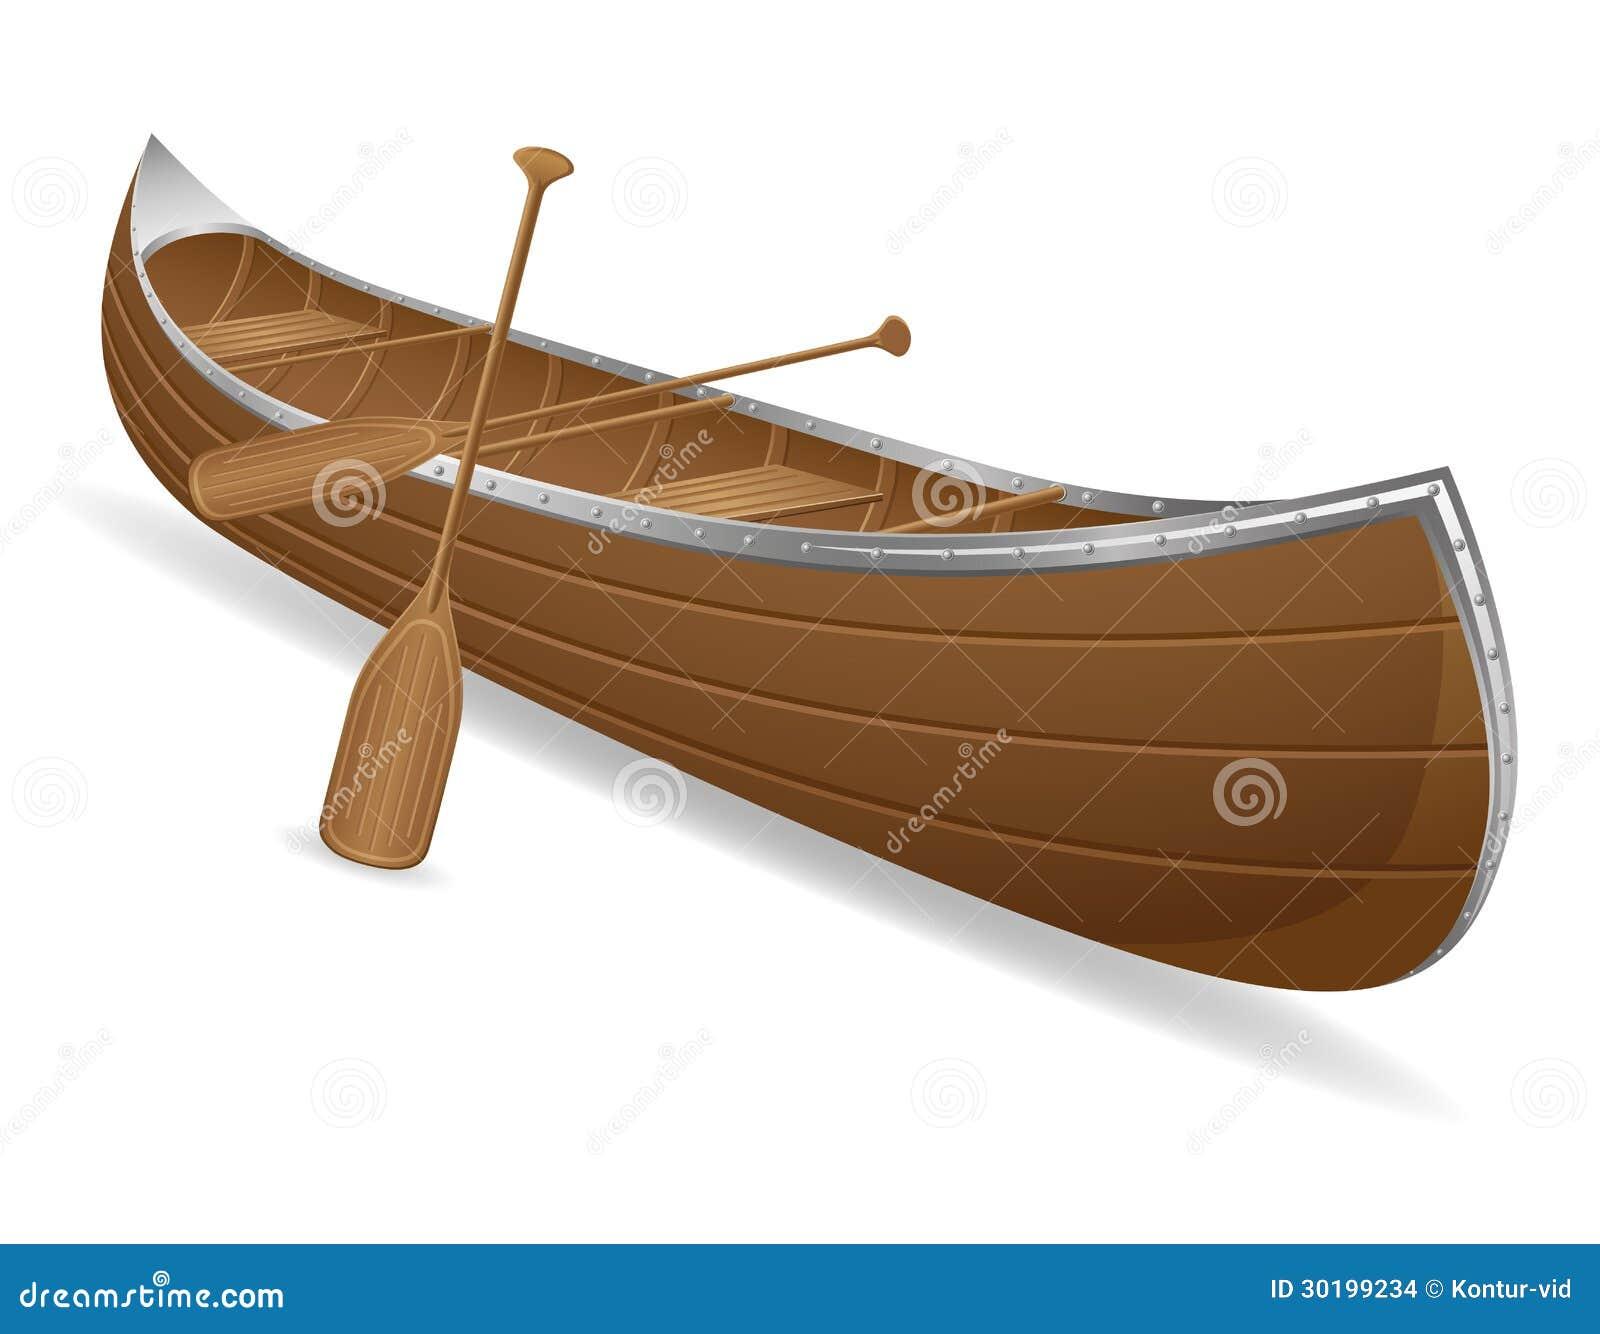 Canoe Vector Illustration Stock Images - Image: 30199234